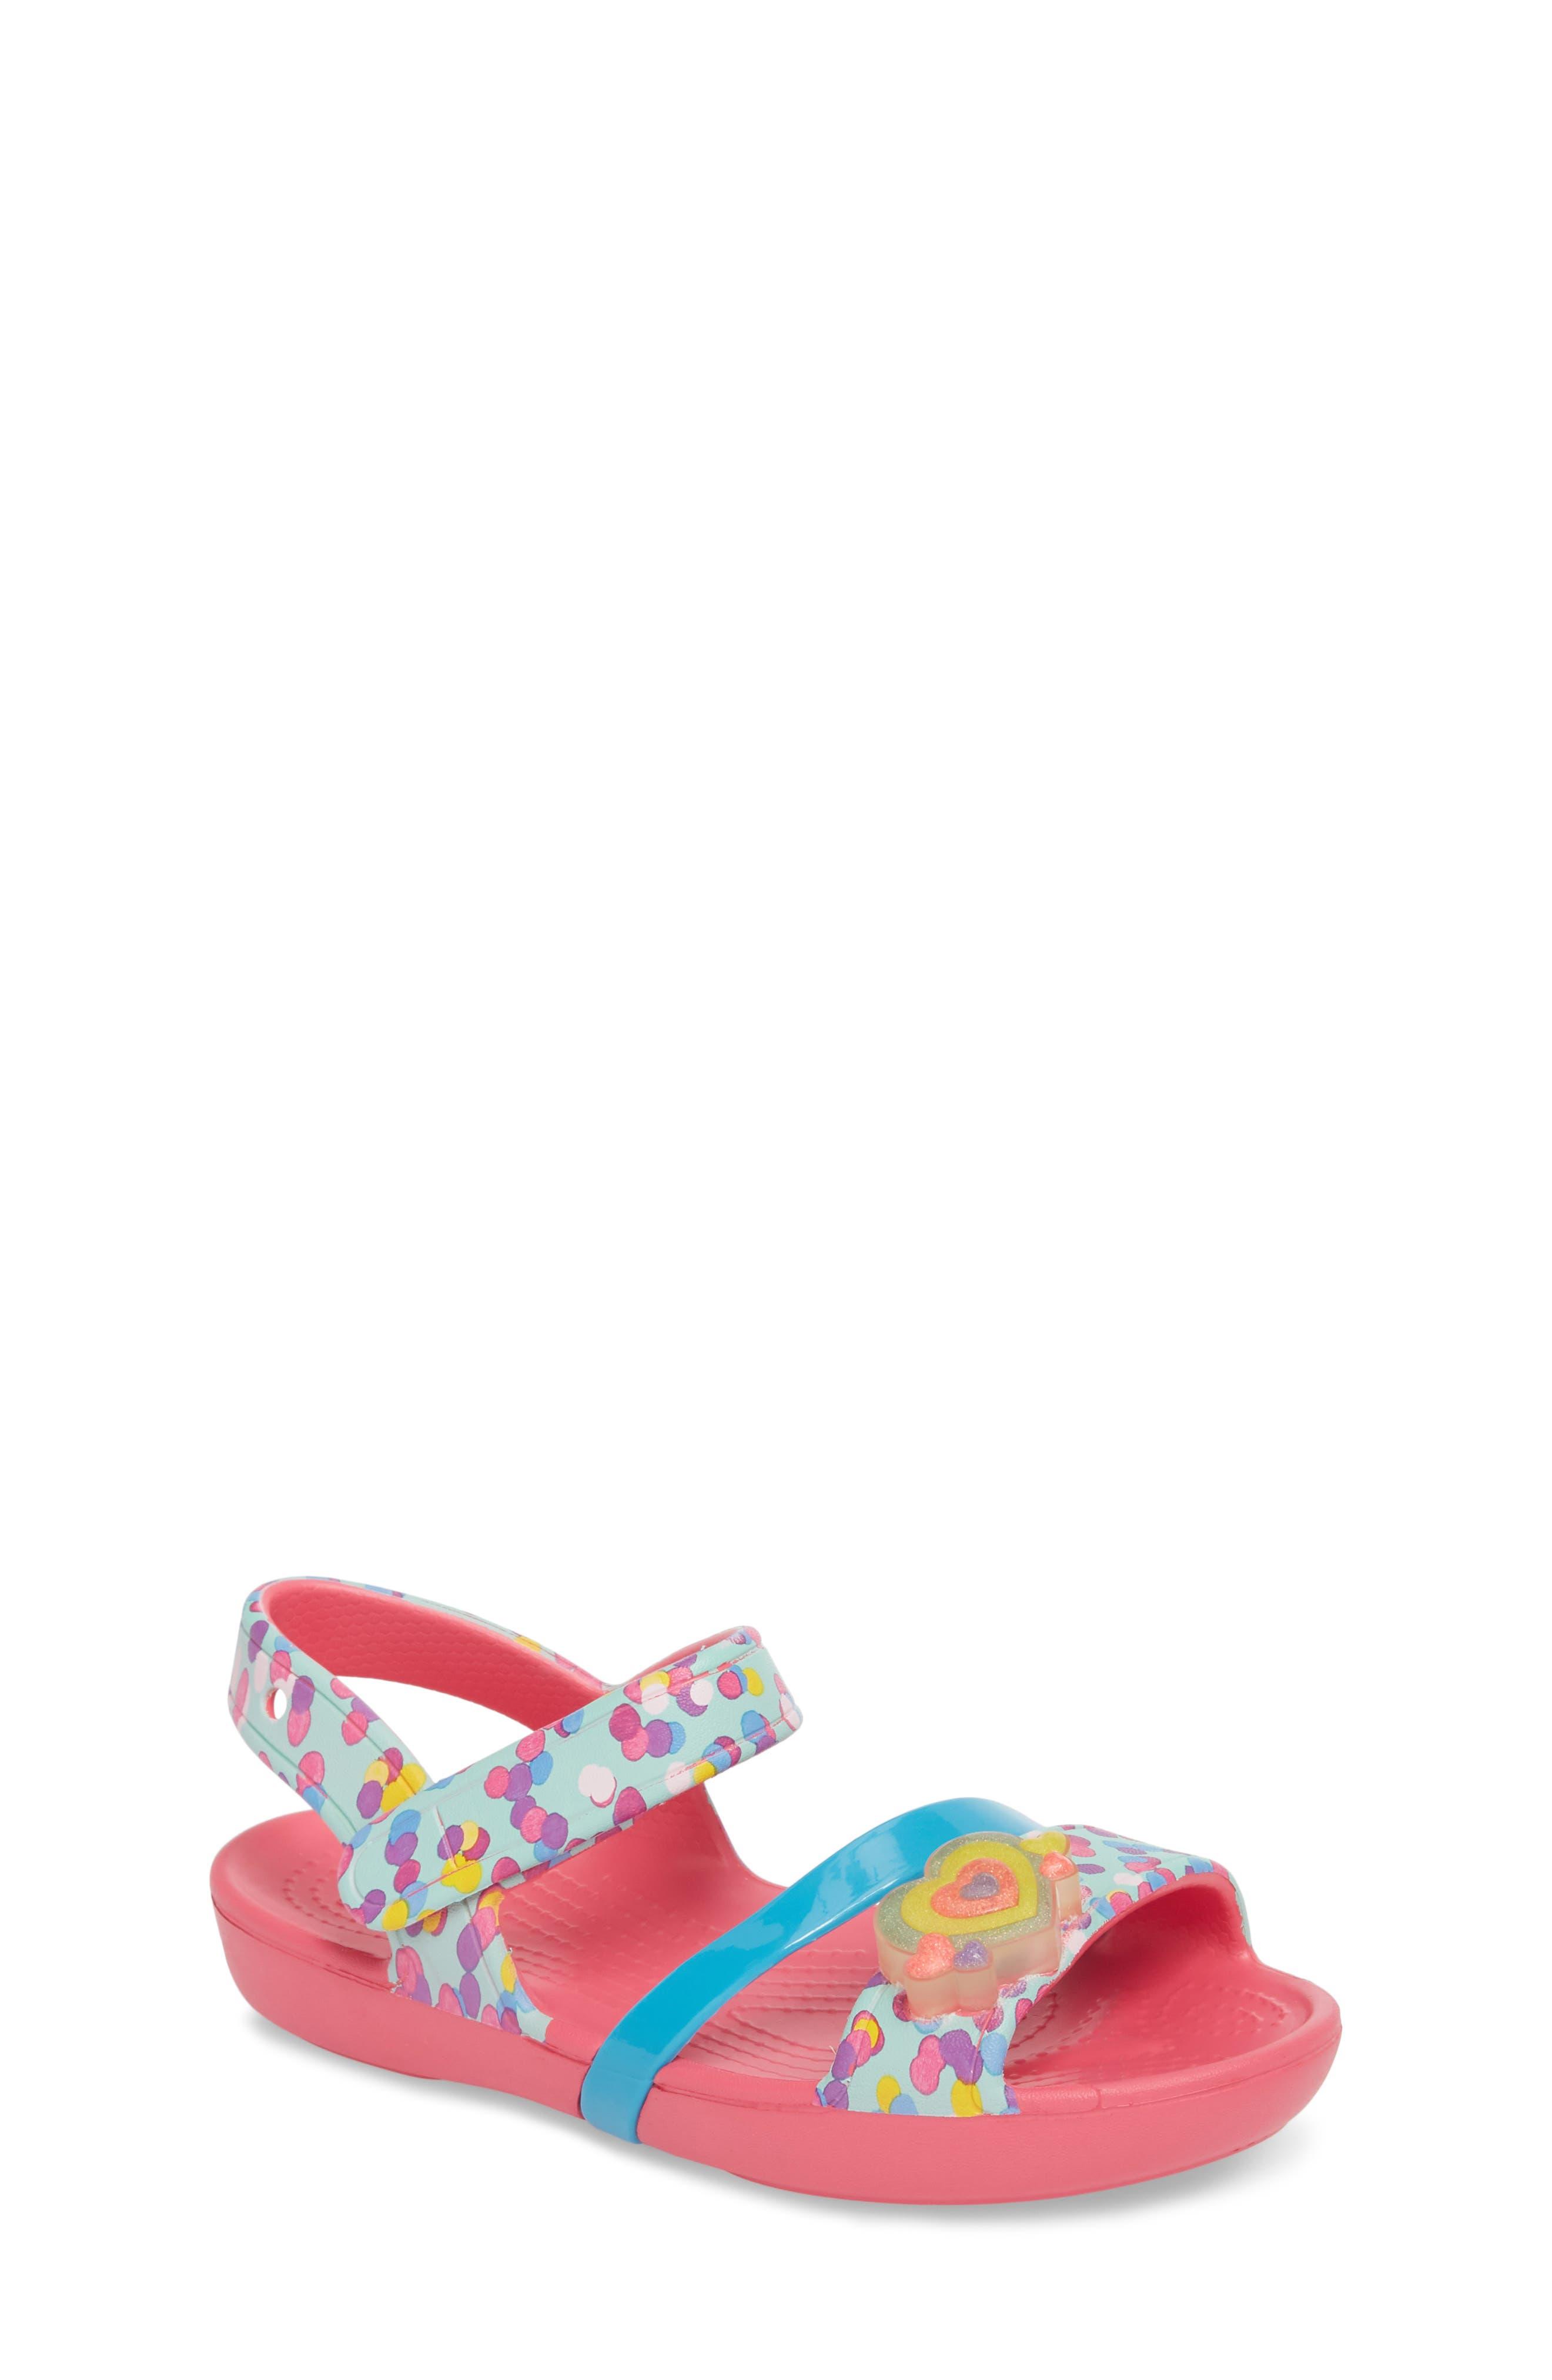 Lina Light-Up Sandal,                         Main,                         color, 655